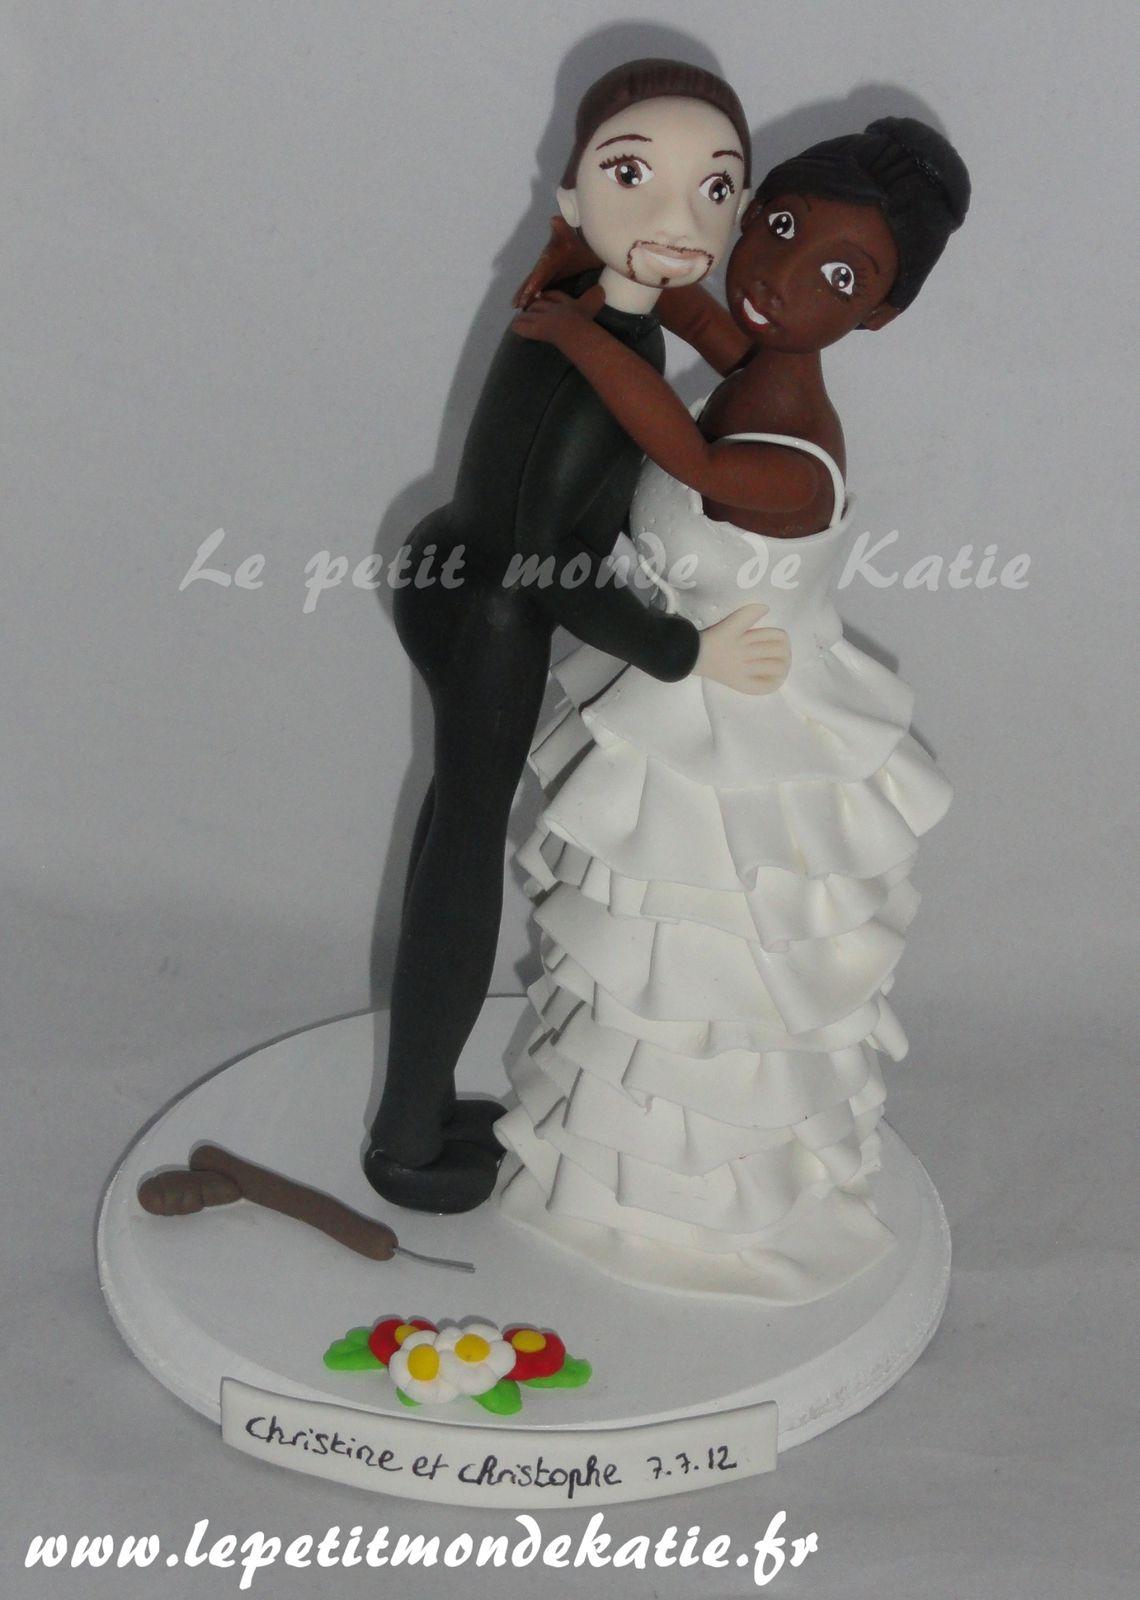 album couples mixtes - Figurine Mariage Mixte